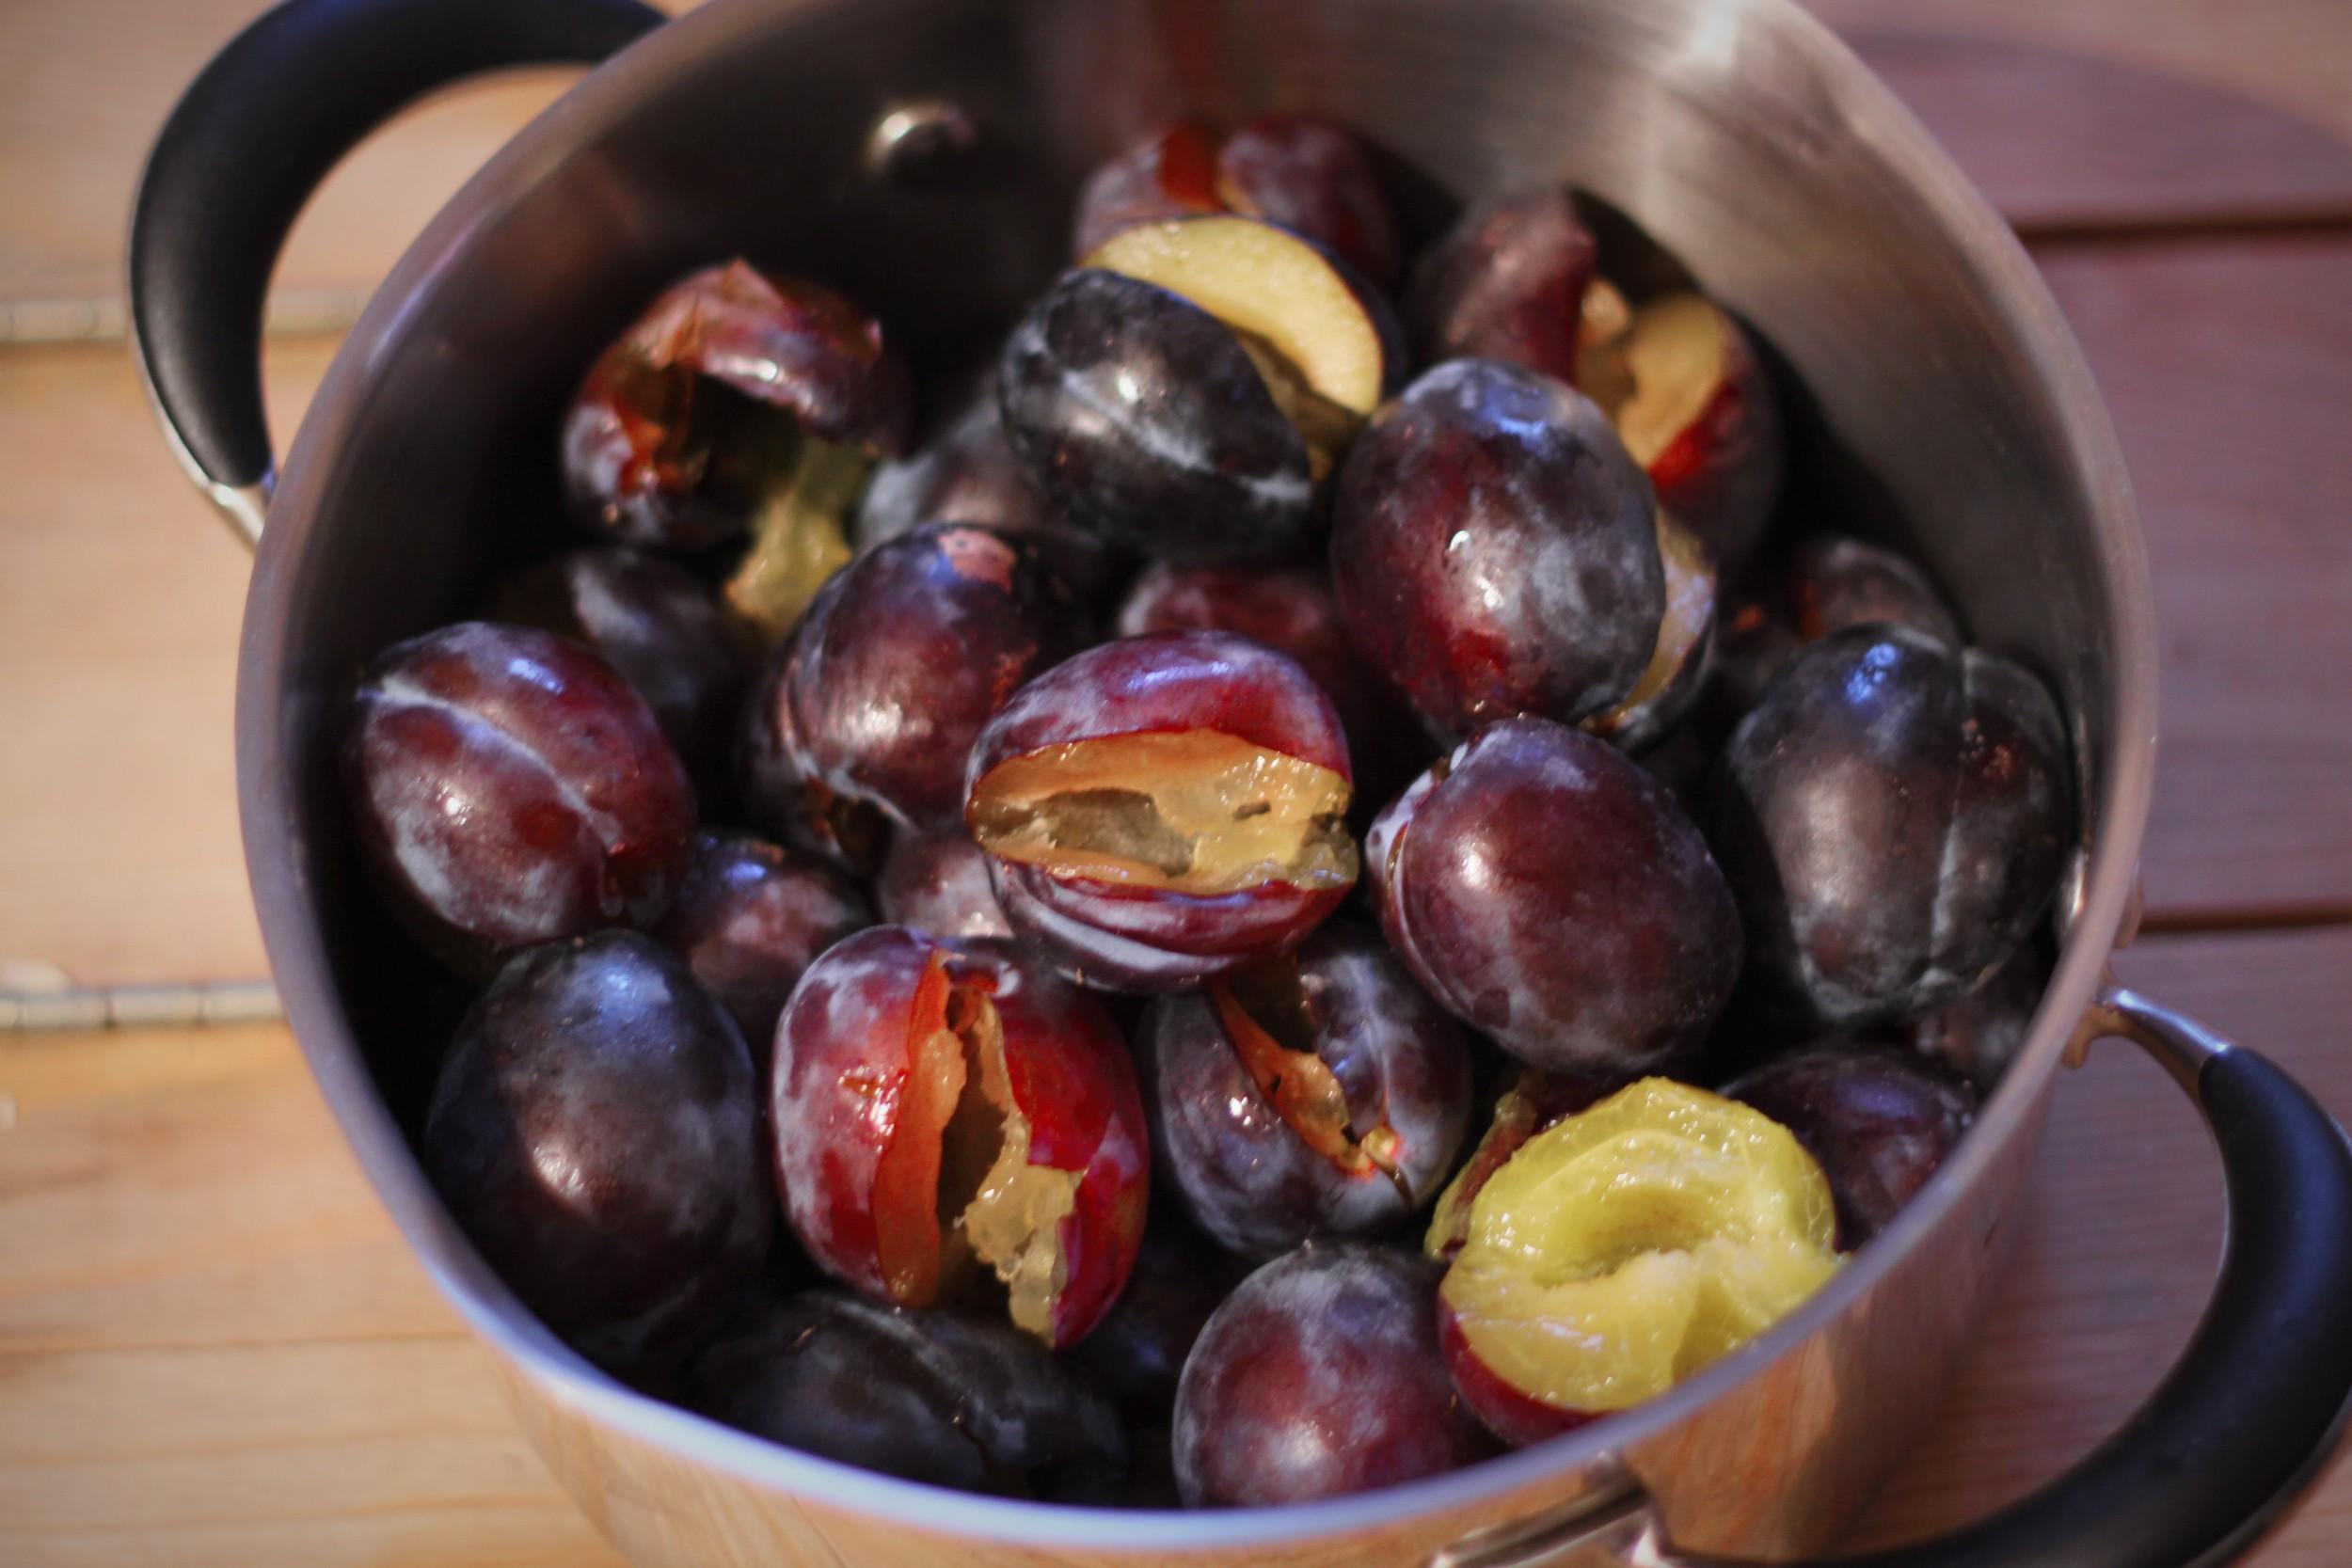 Polish plums